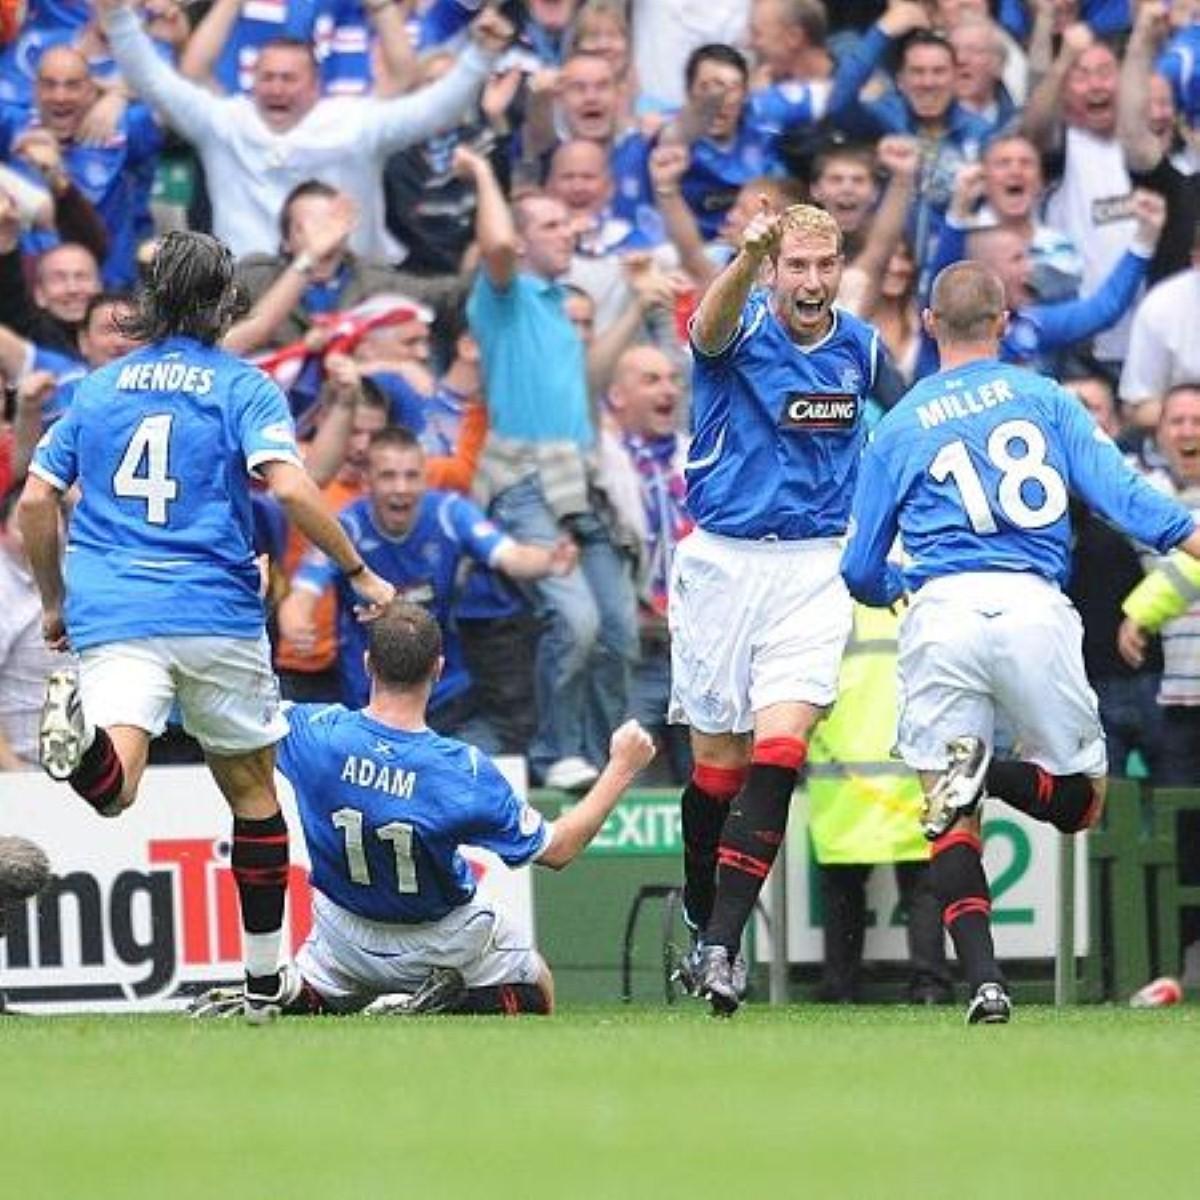 Rangers celebrate an Old Firm derby win